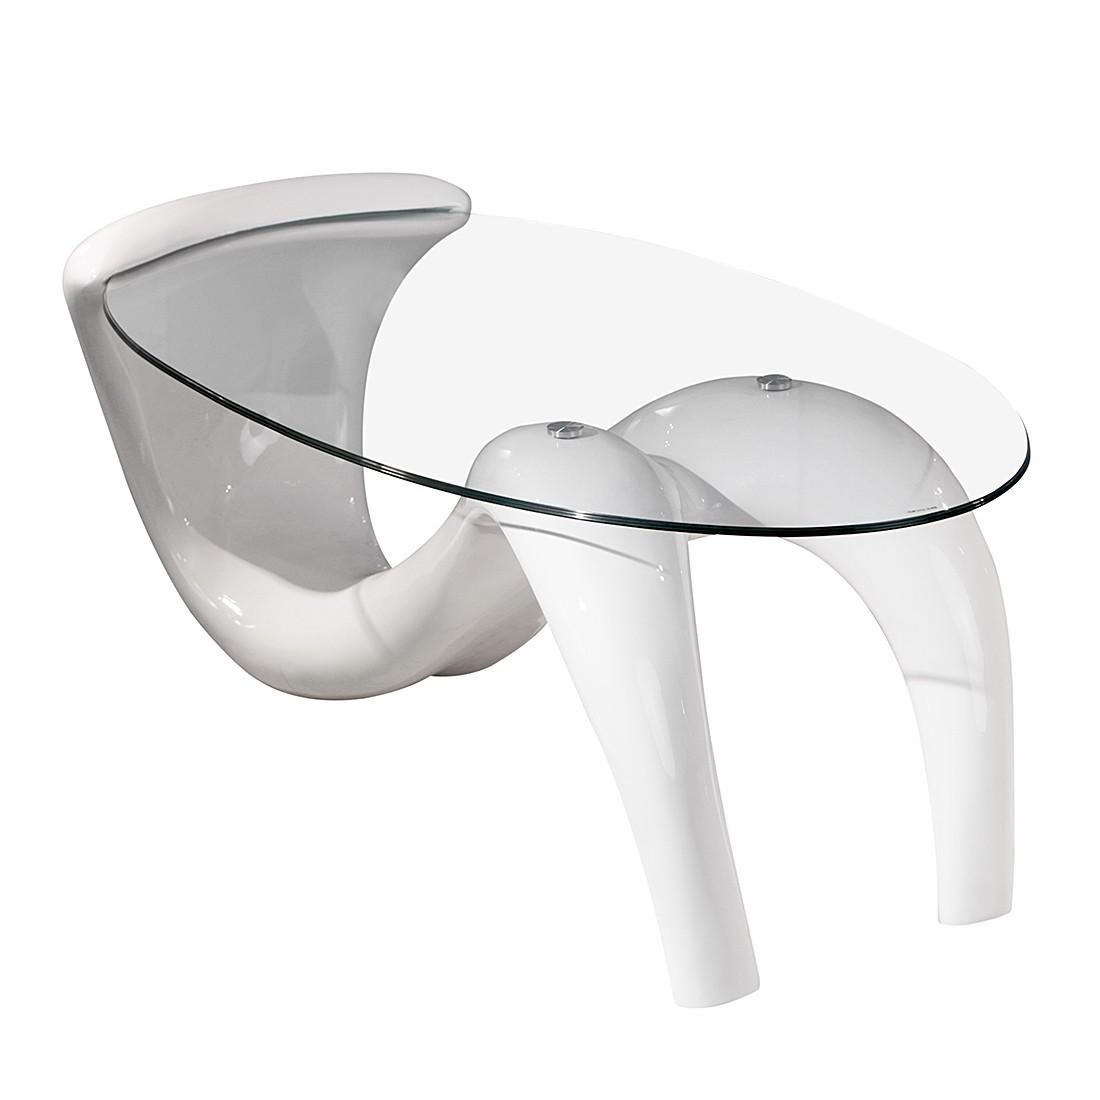 Tavolino da salotto Wave - Bianco lucido, Studio Monroe